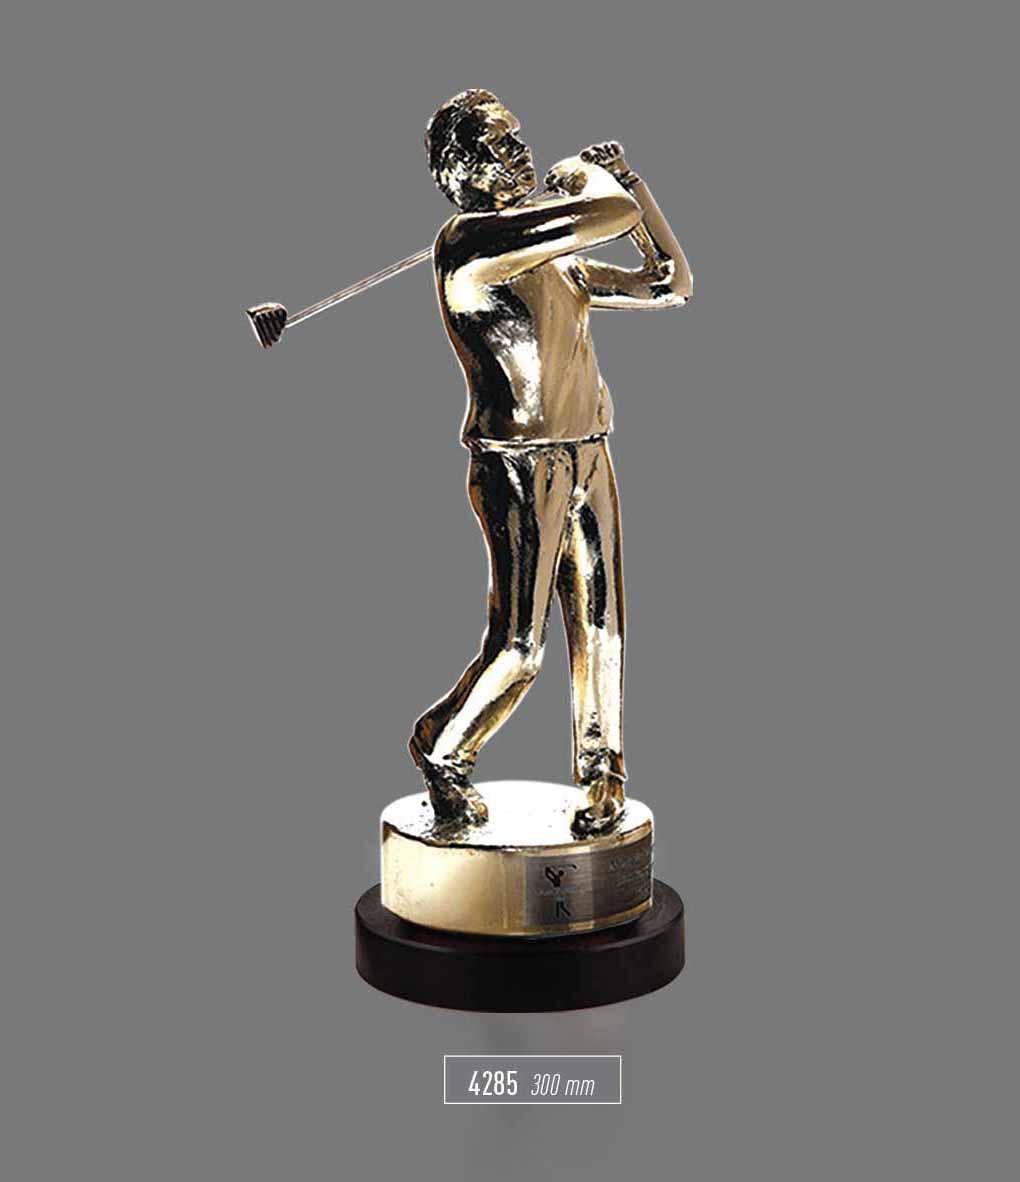 4285 - Sport Award